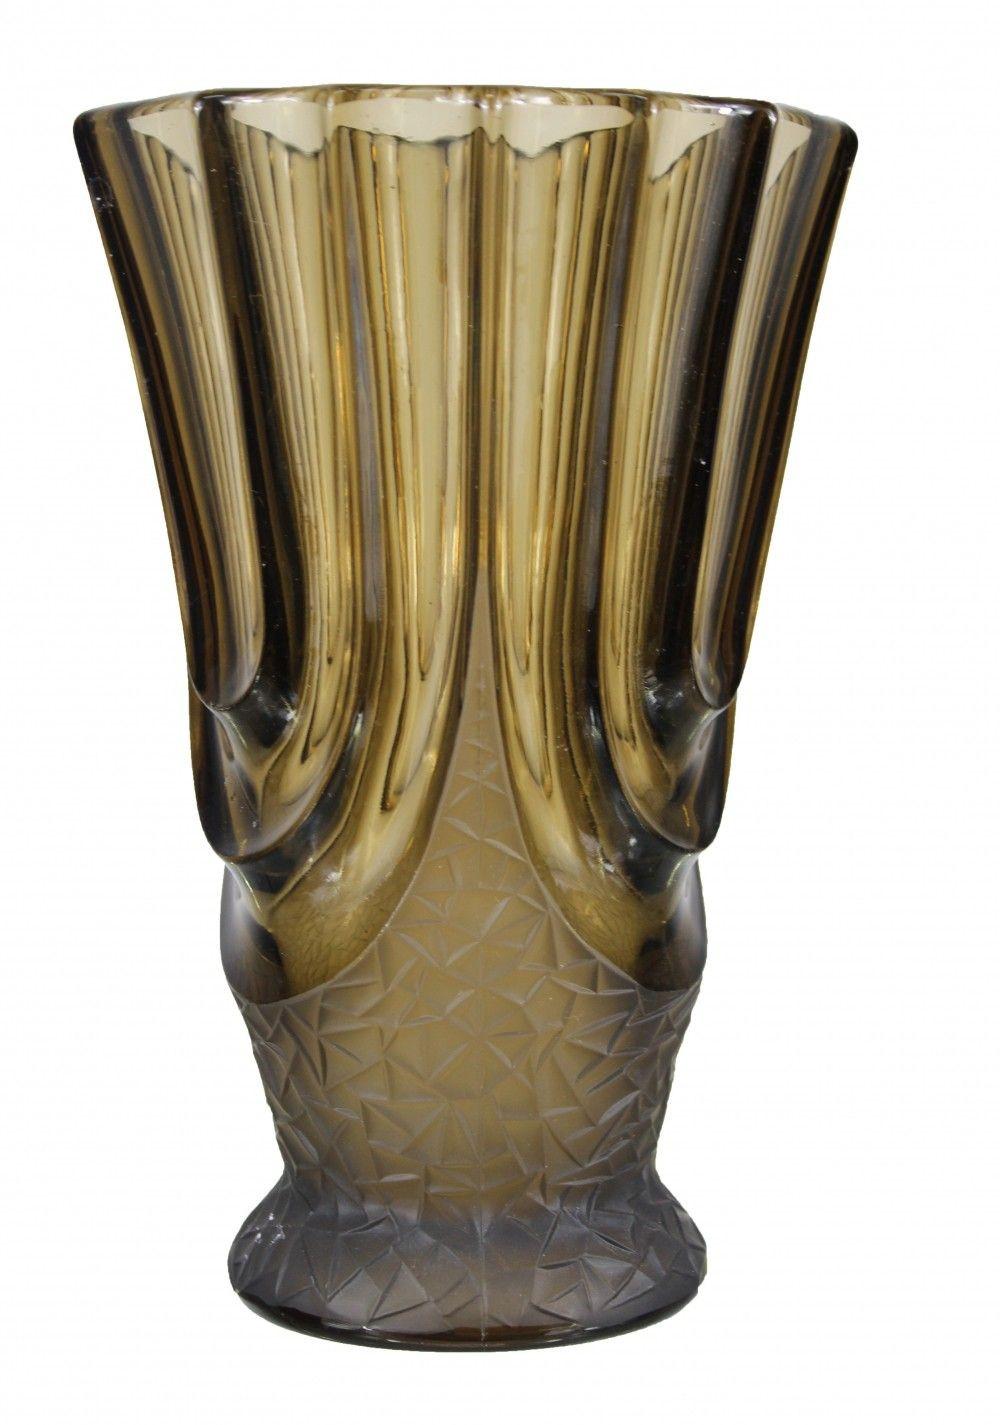 black glass vase vintage of italian art deco smoked glass vase 1930s various vintage design with italian art deco smoked glass vase 1930s